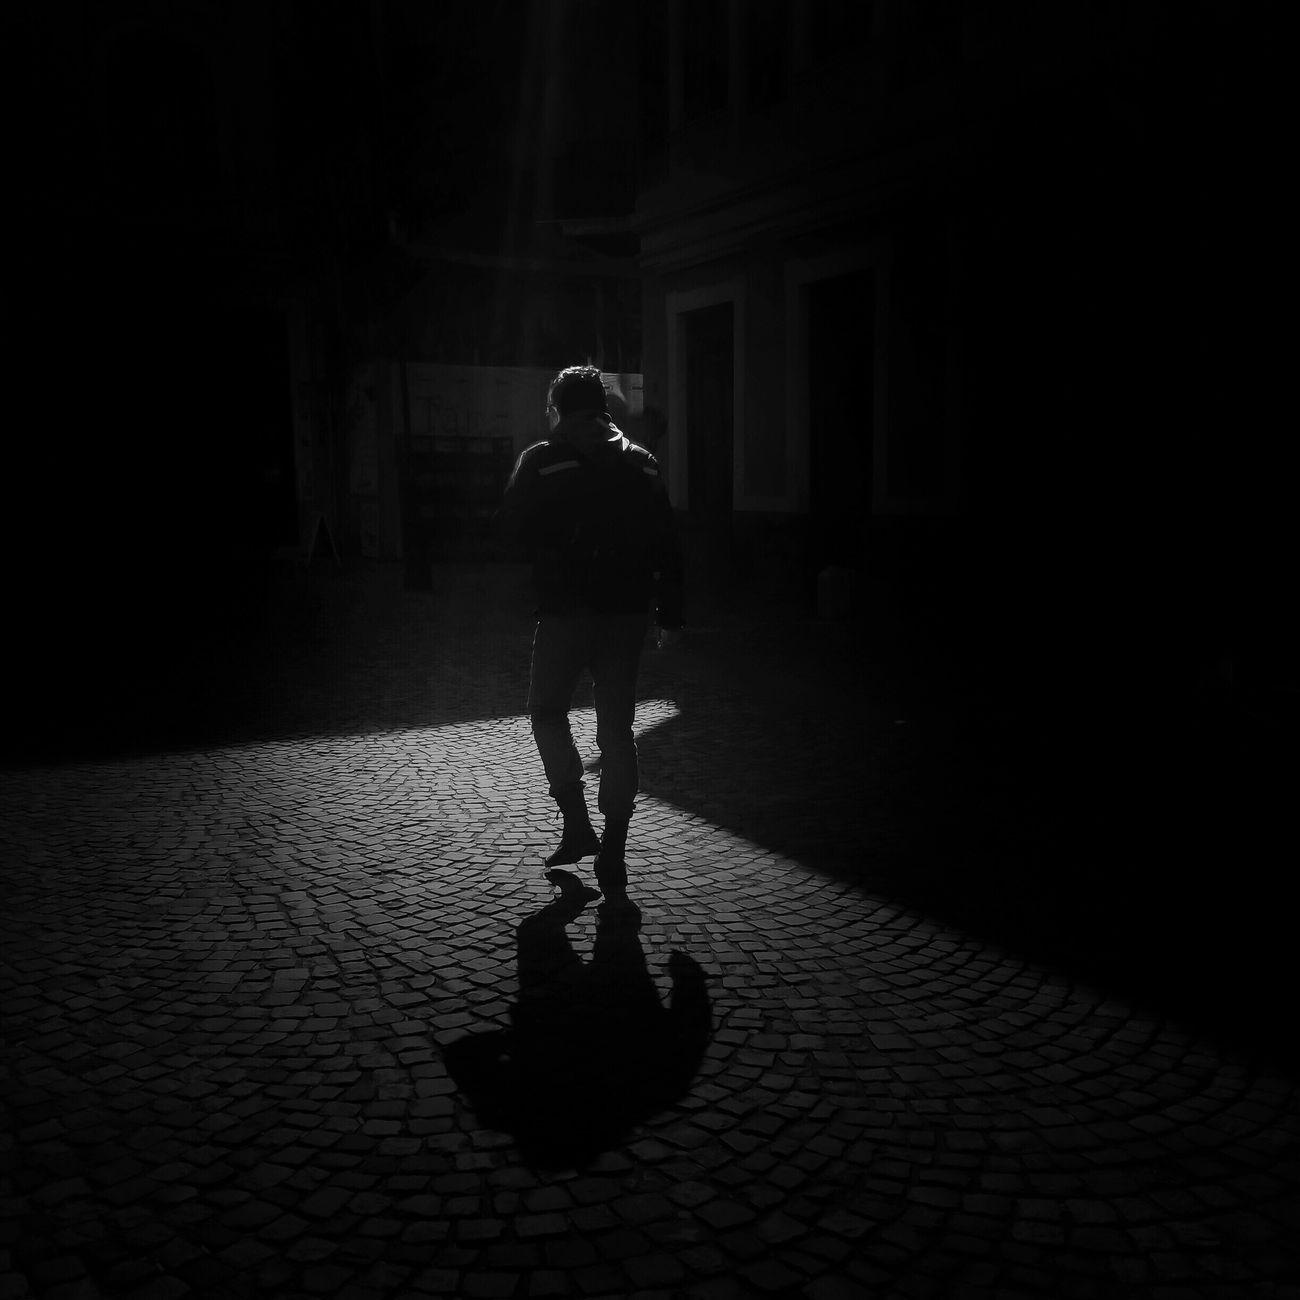 Black on black Blackandwhite Leica AMPt - Vanishing Point Black And White Shadow Lighning Beat-Man